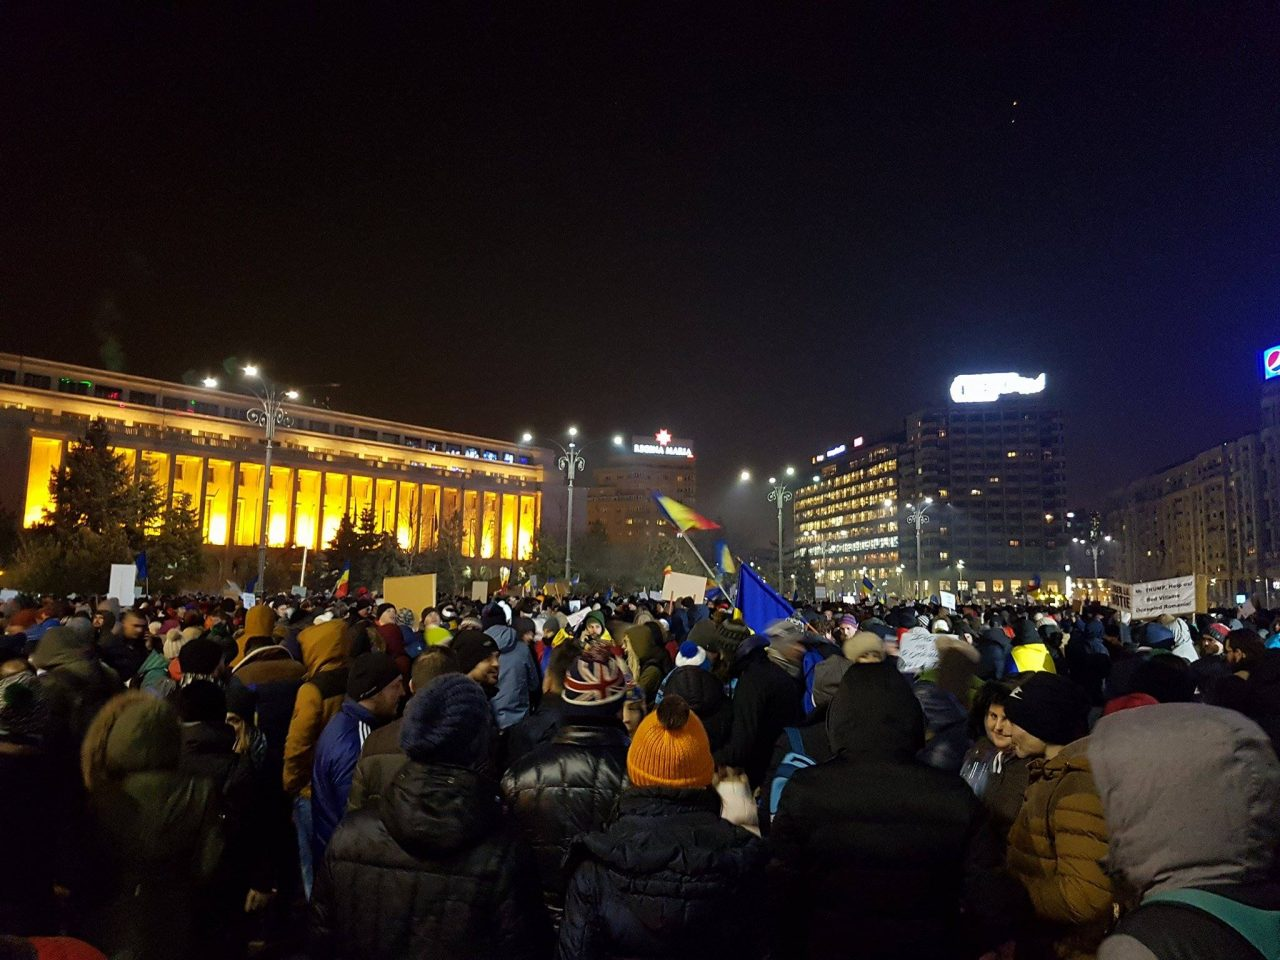 Bucharest-protests-Feb-1-Romania-Insider-2-1280x960.jpg